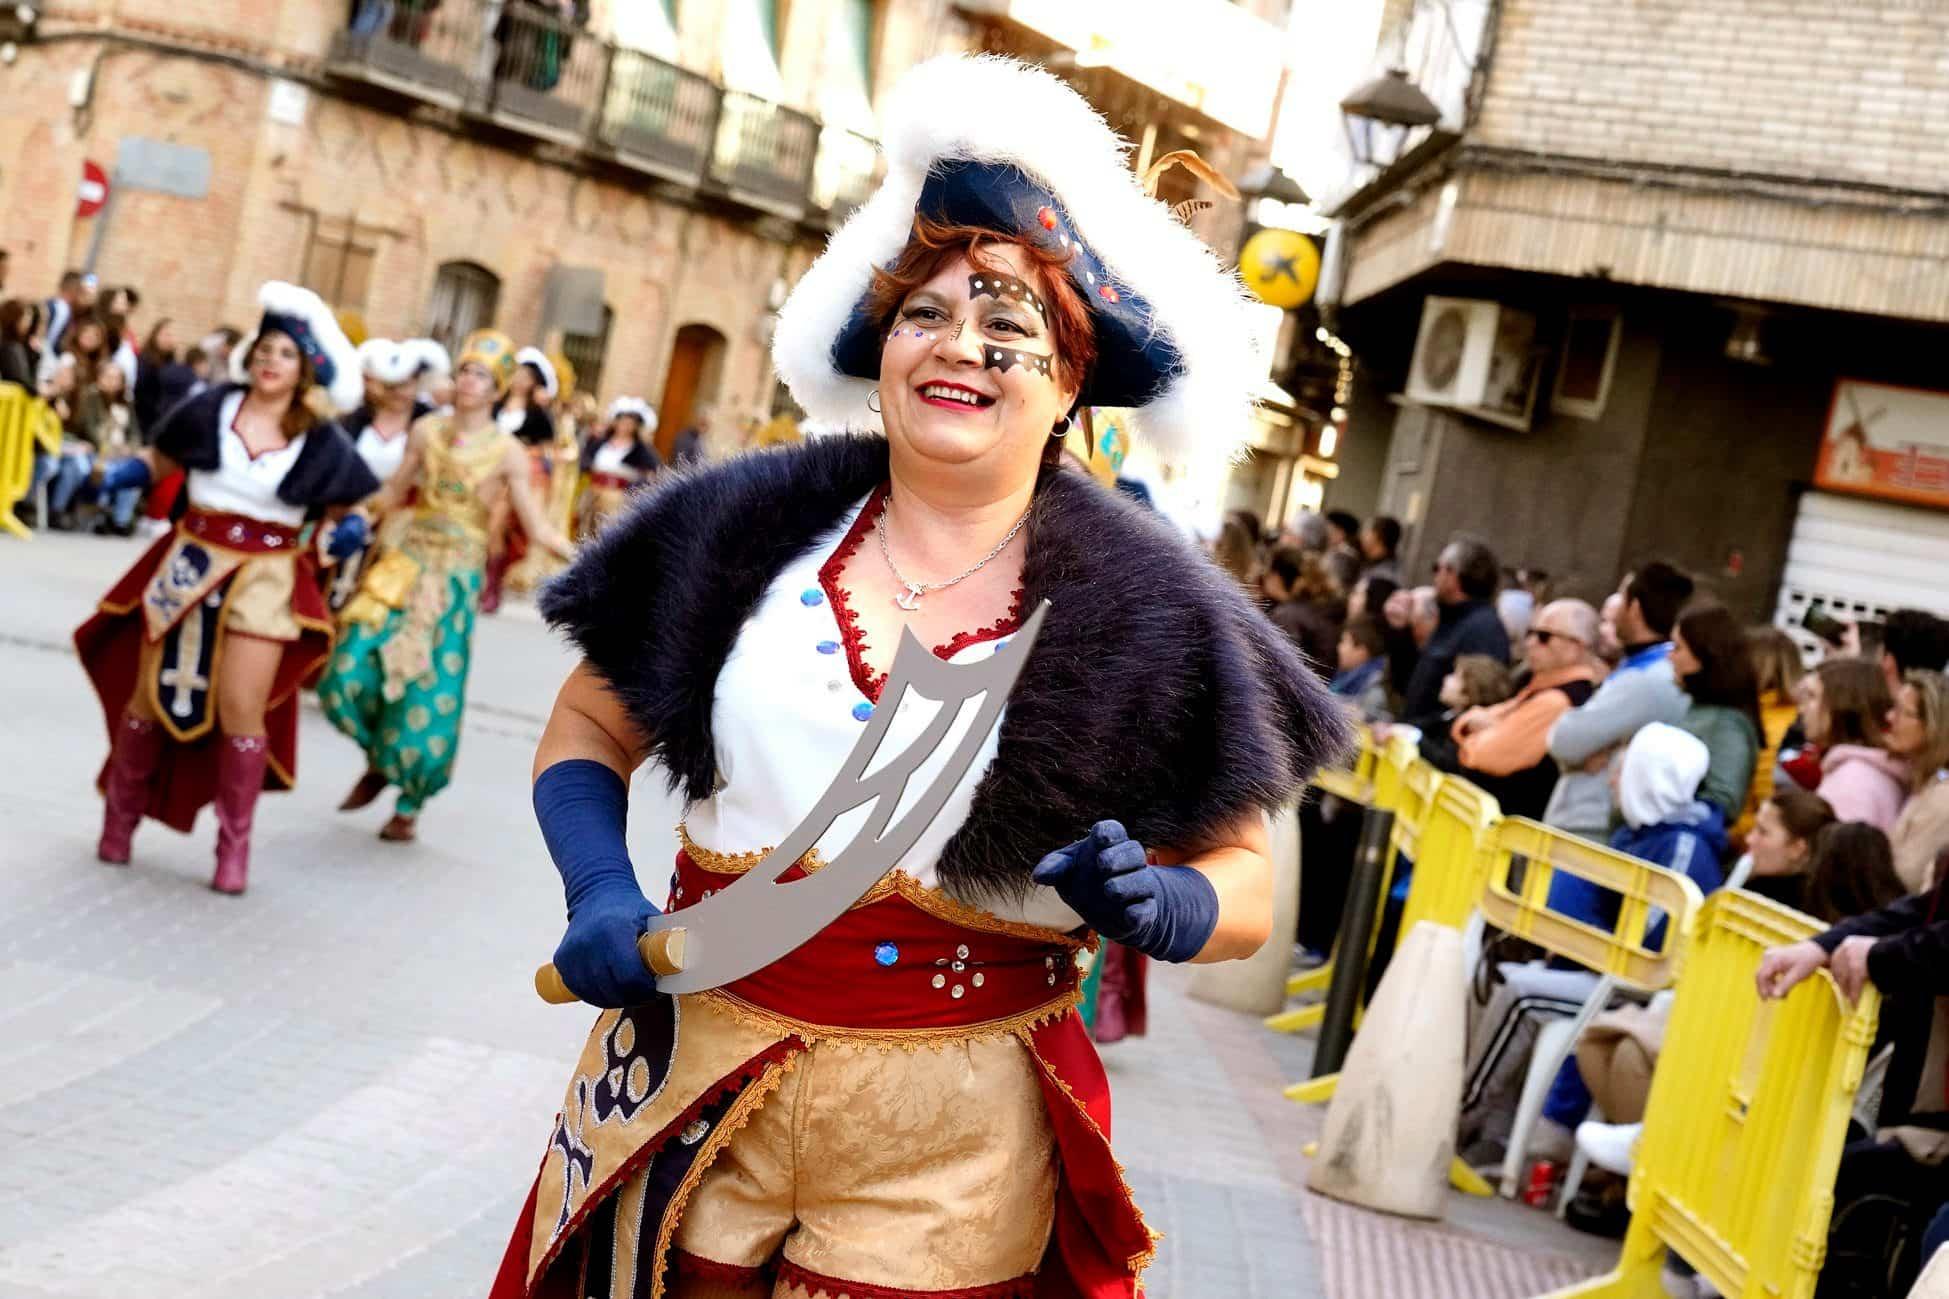 Carnaval de herencia 2020 ofertorio 144 - Selección de fotografías del Ofertorio del Carnaval de Herencia